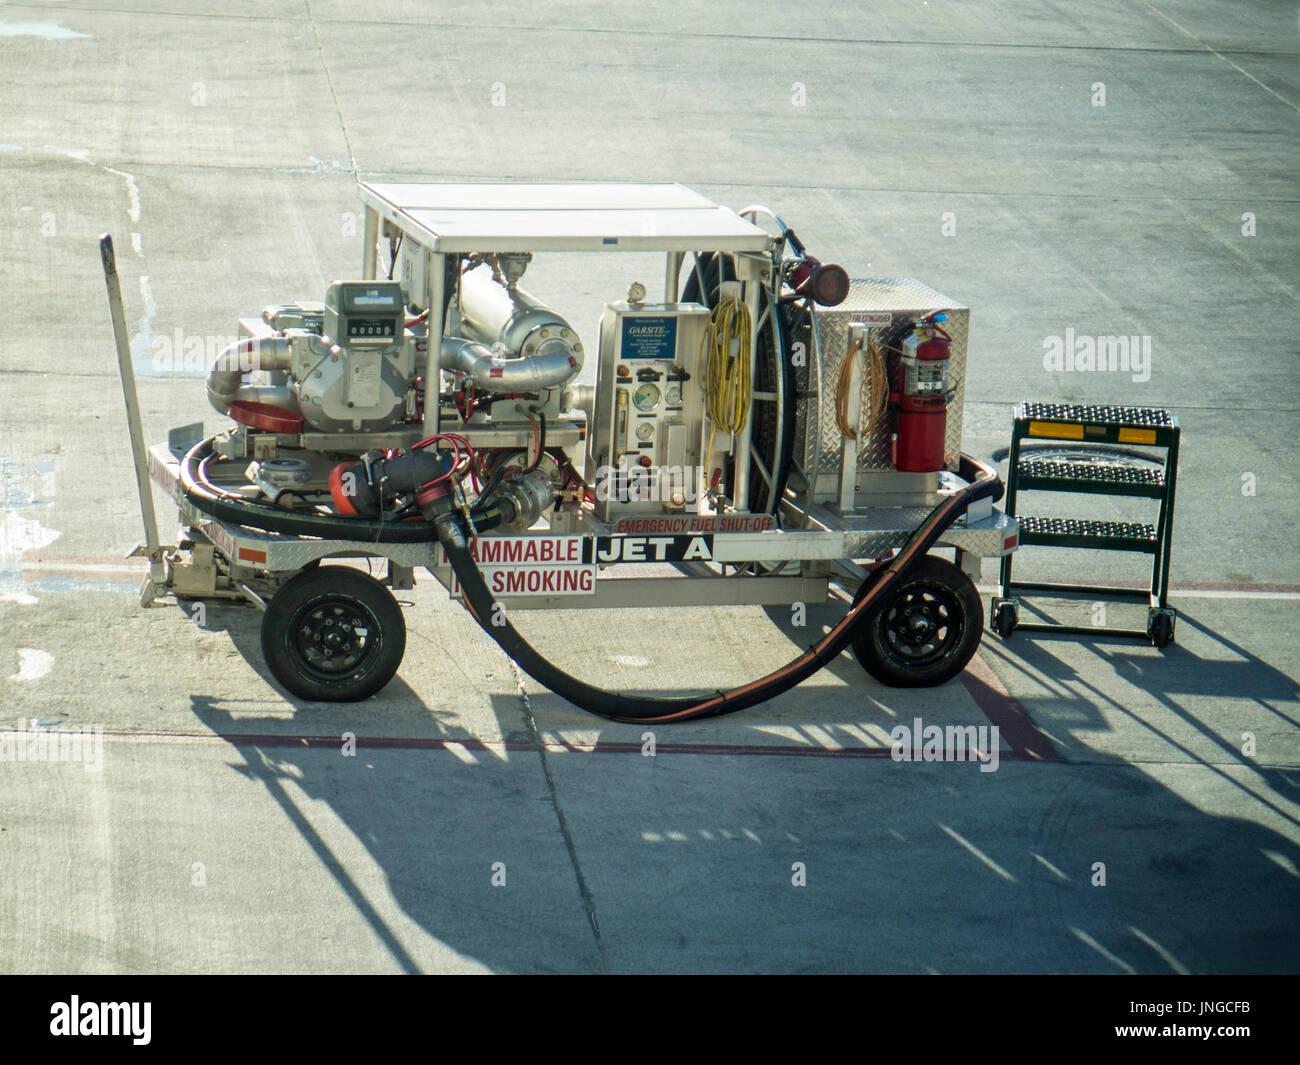 Garsite aircraft refueler, Towable Hydrant Cart - Stock Image